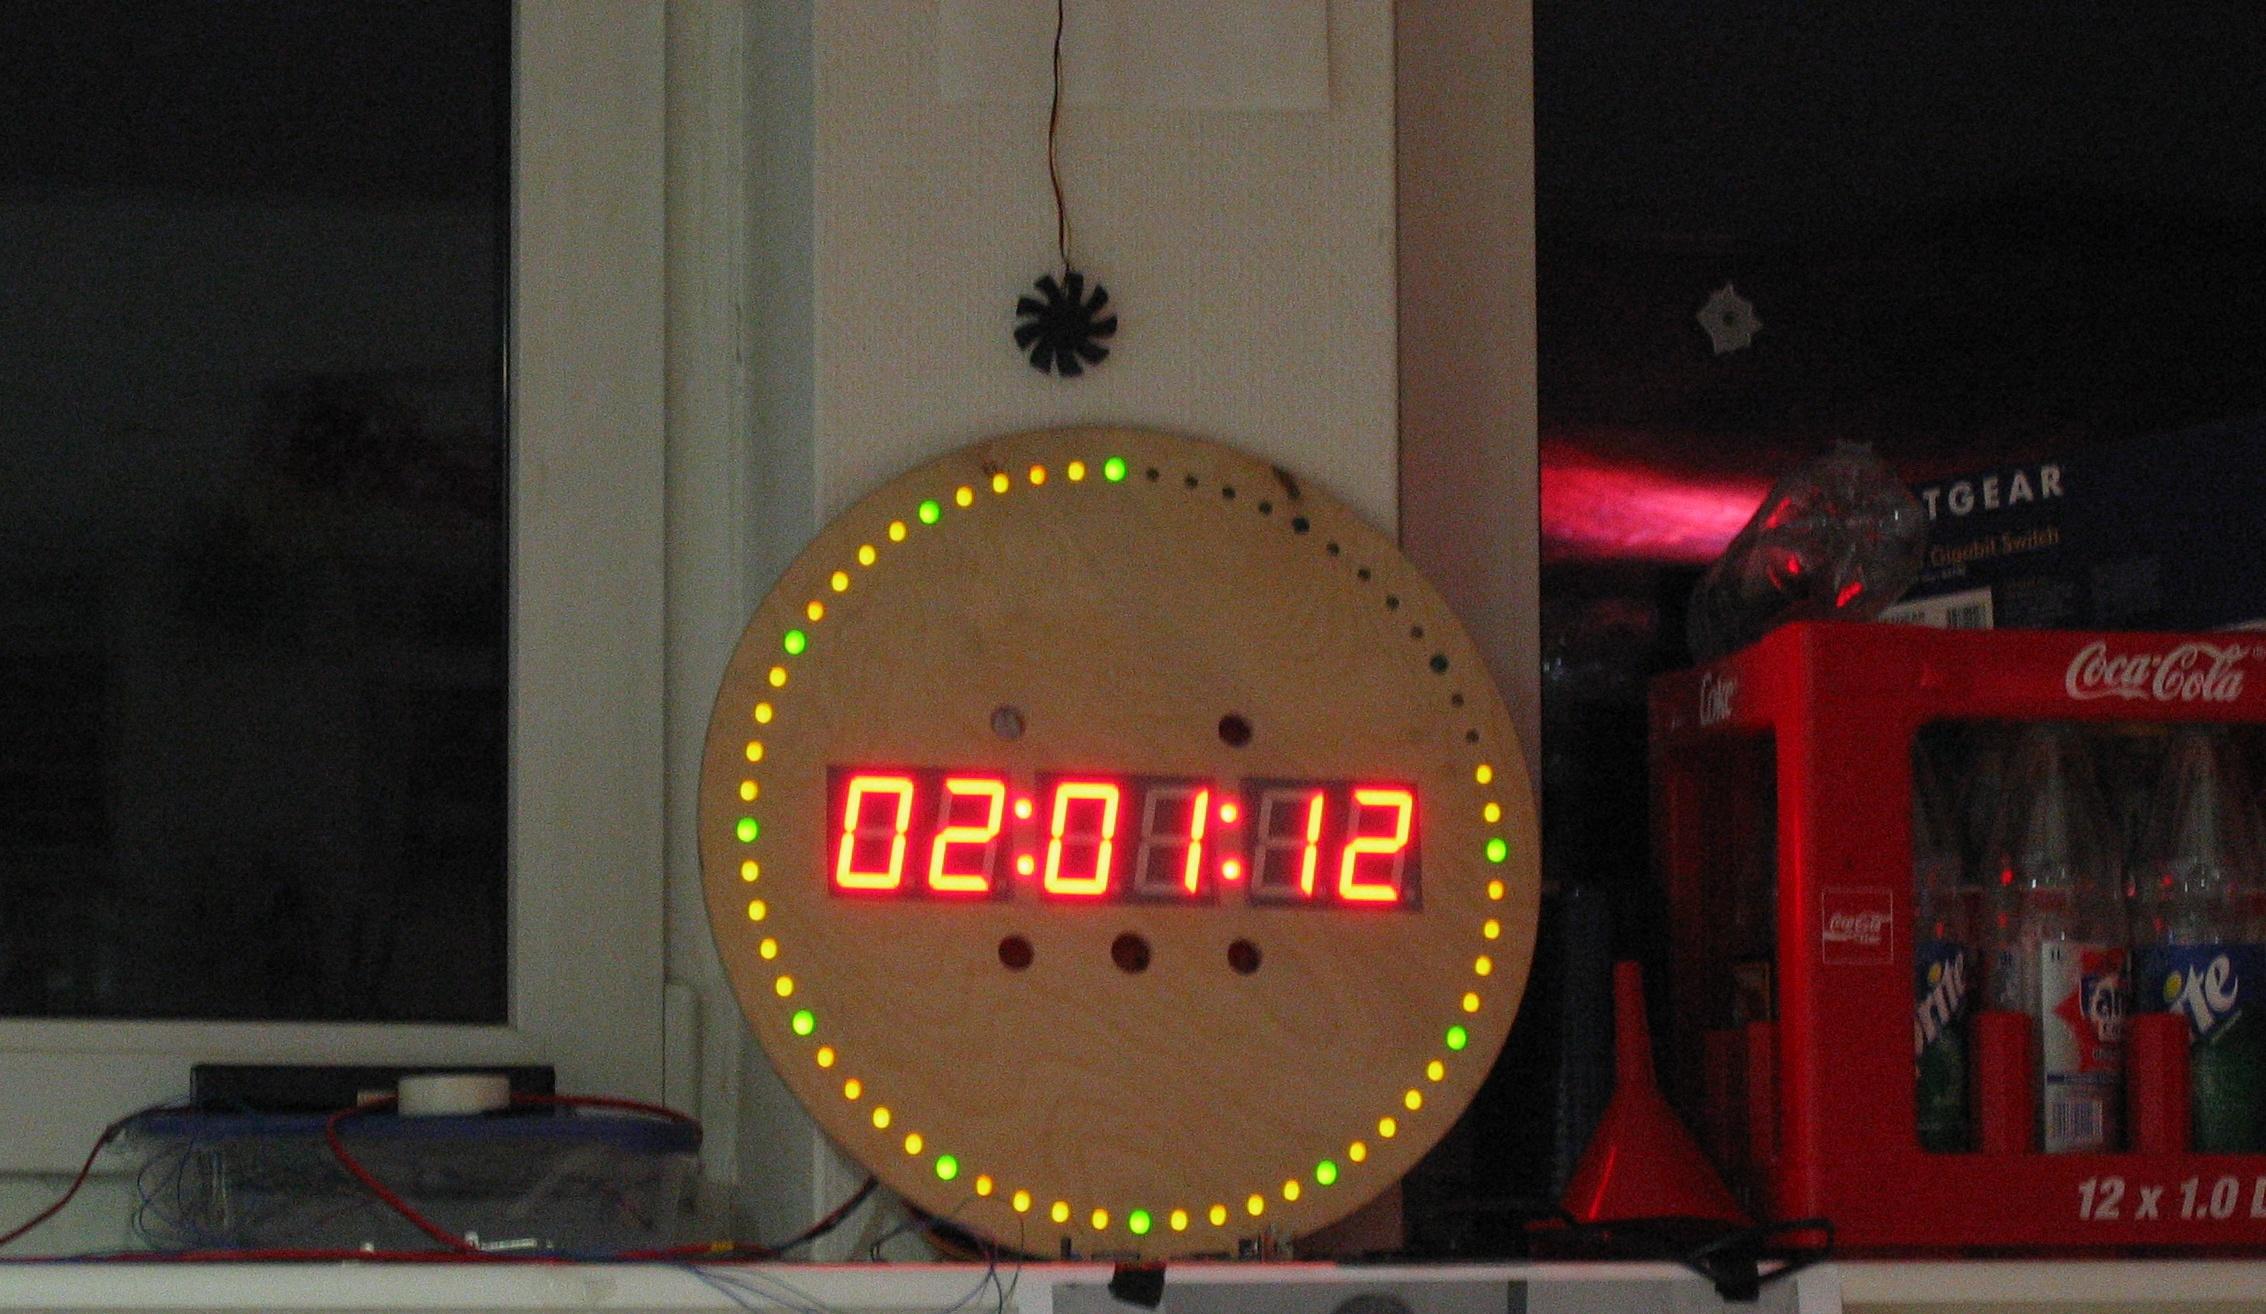 A Ntp Dcf77 Led Clock Ledclockcircuitboard2jpg